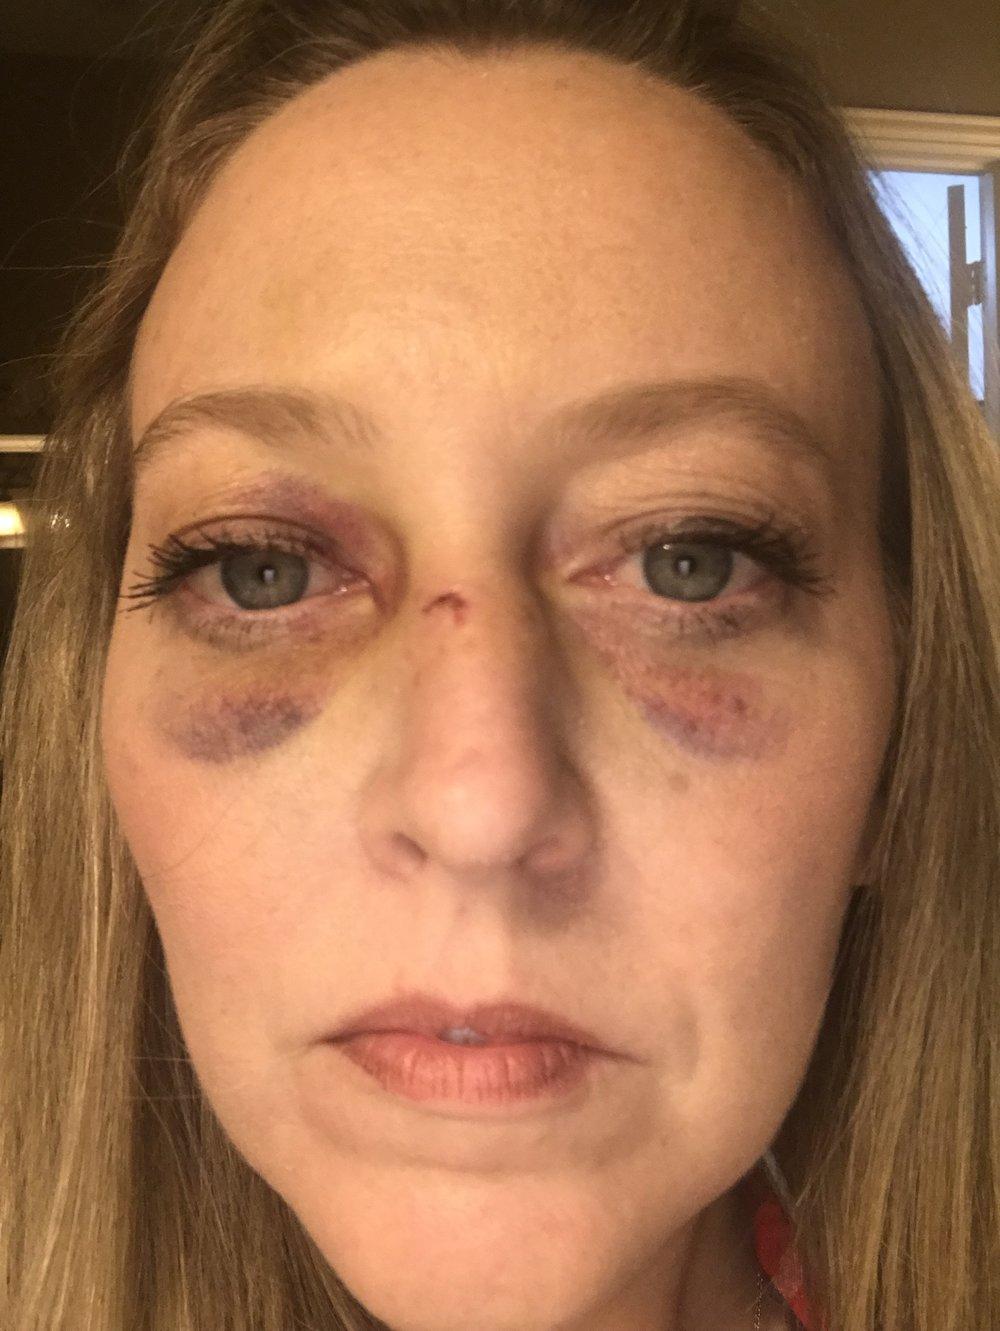 Jennifer Leedy three days after the attack.